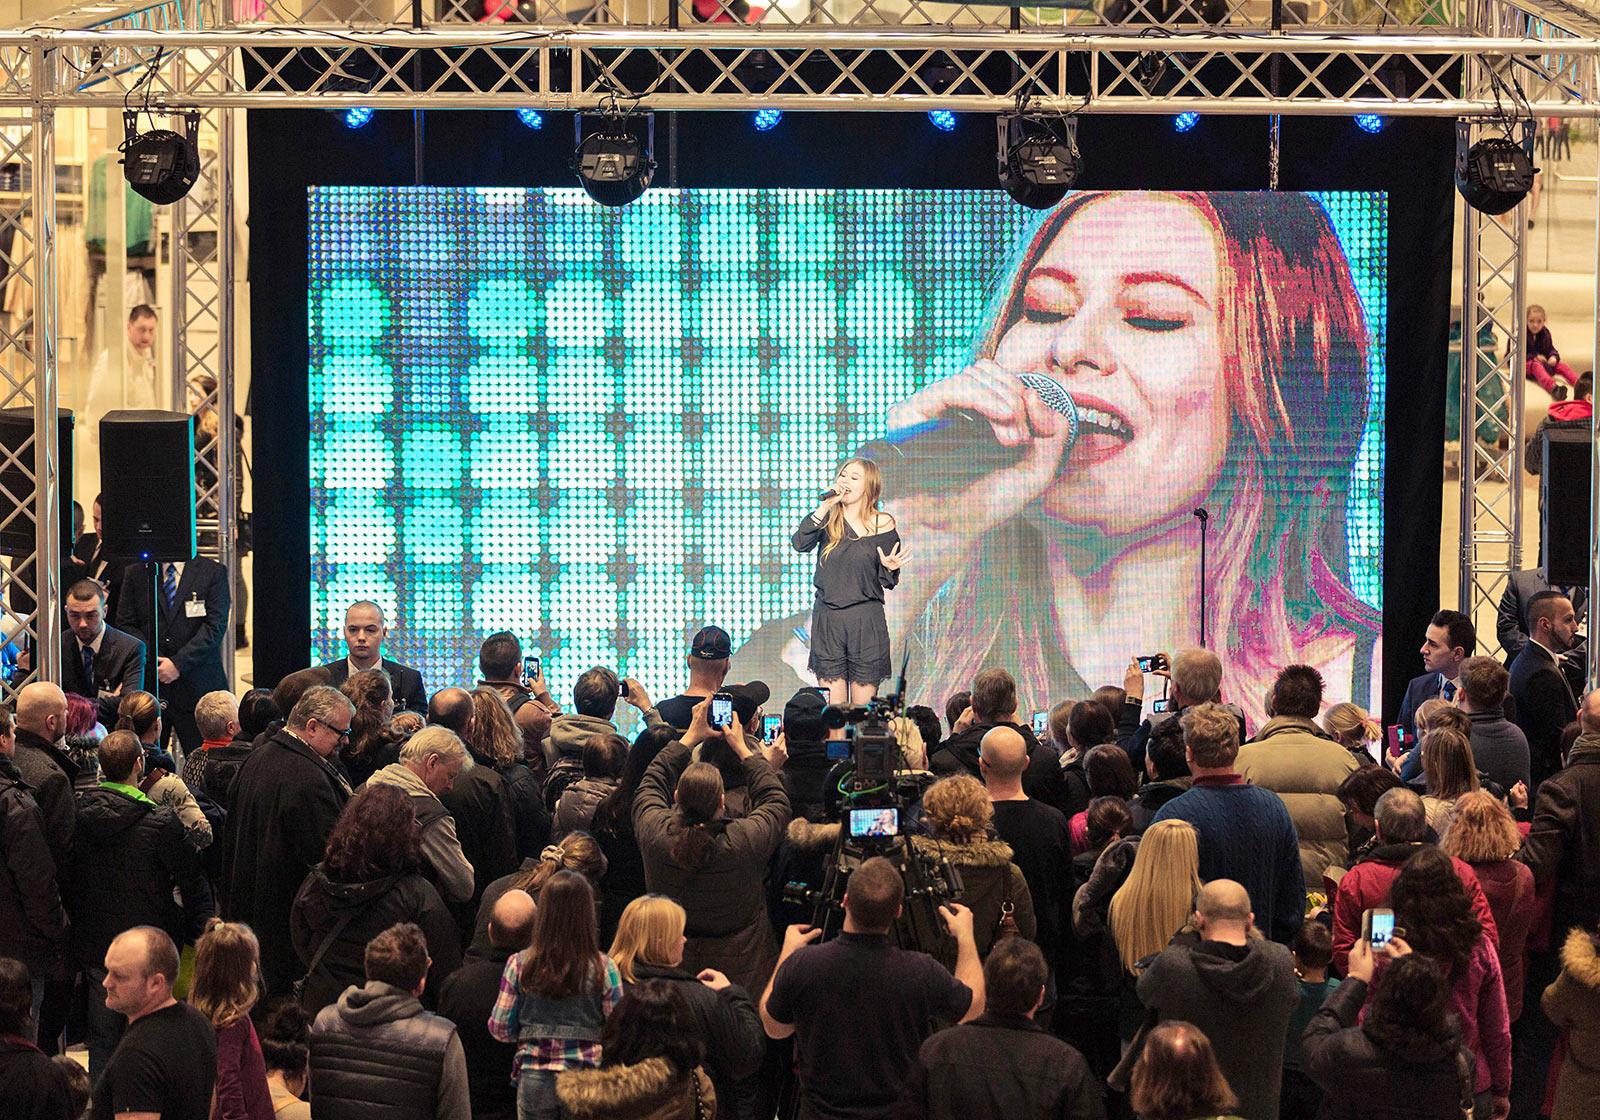 Austria's song contest representative Zoë ensures that the vibes are good. Photo: SES/Robert Fritz